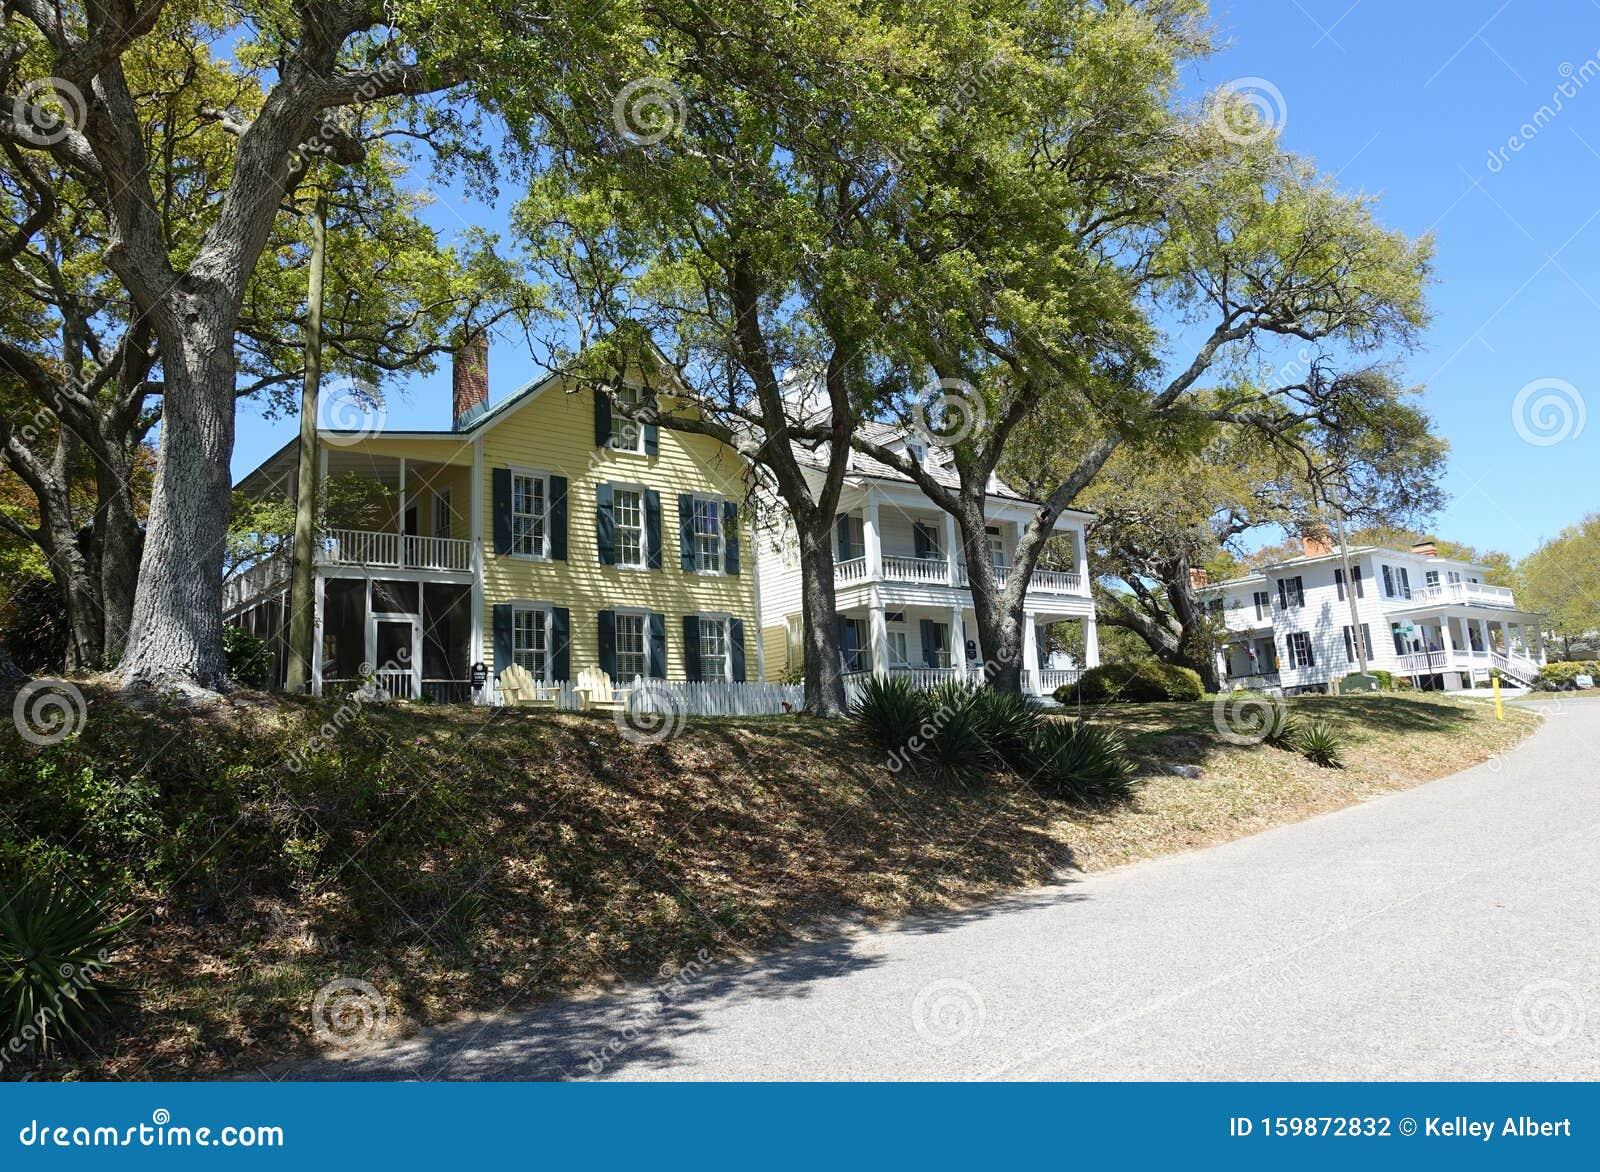 A line of Coastal Houses in Southport, North Carolina